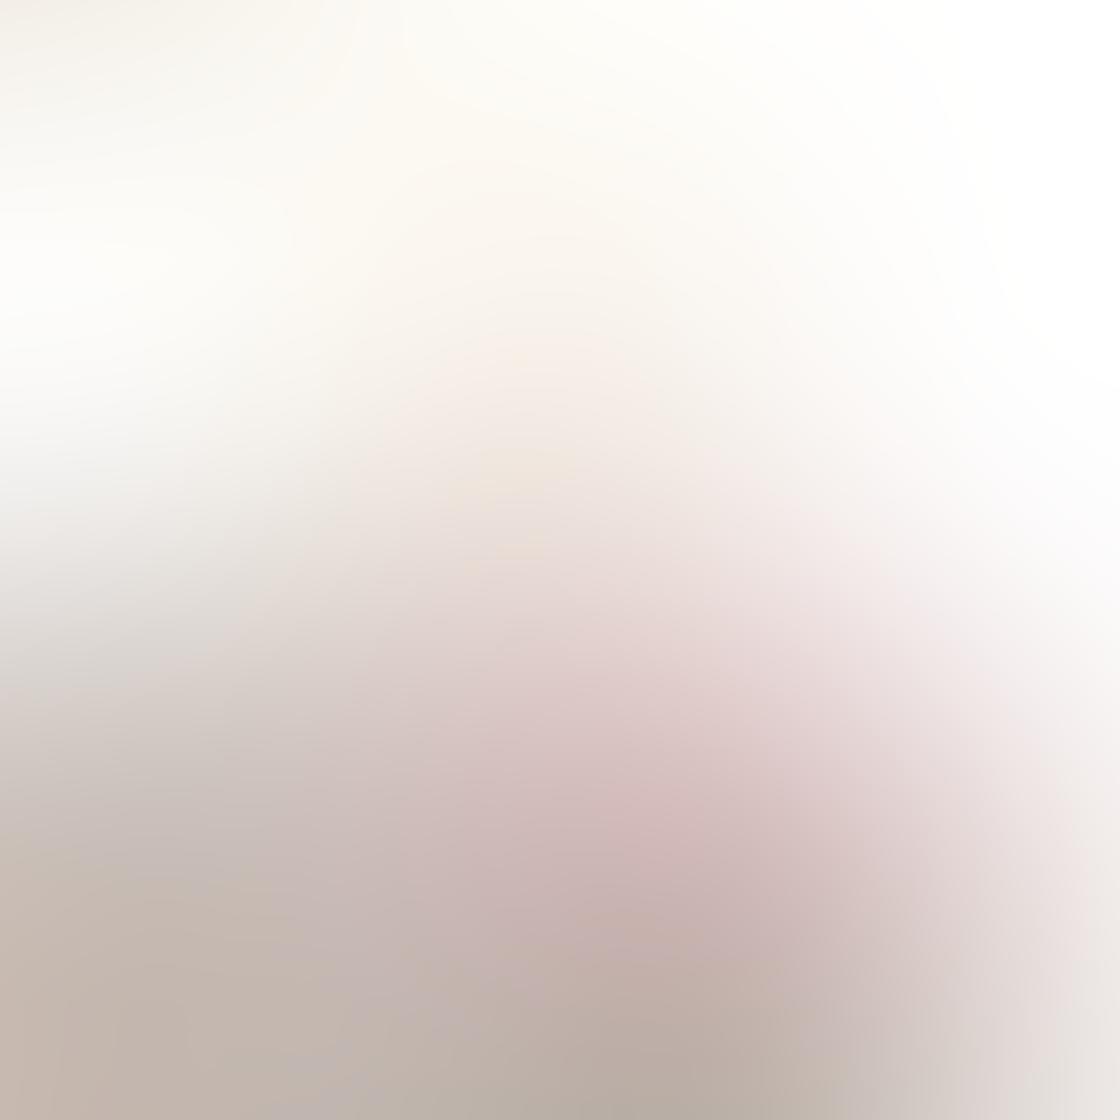 Common iPhone Photo Mistakes 21